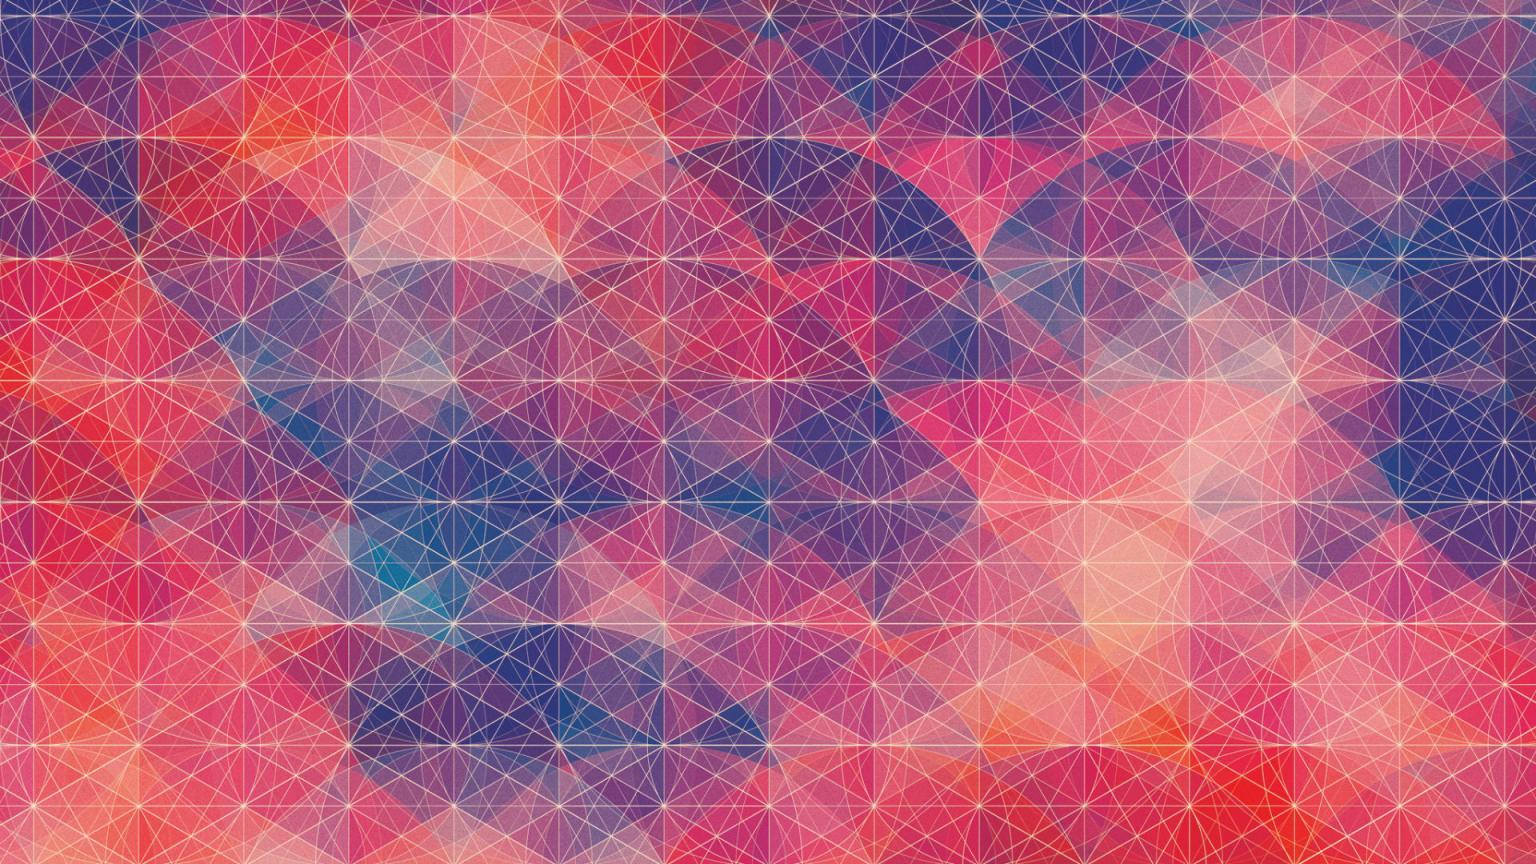 Free Download Geometric Wallpaper Hd Geometric Wallpaper Hd